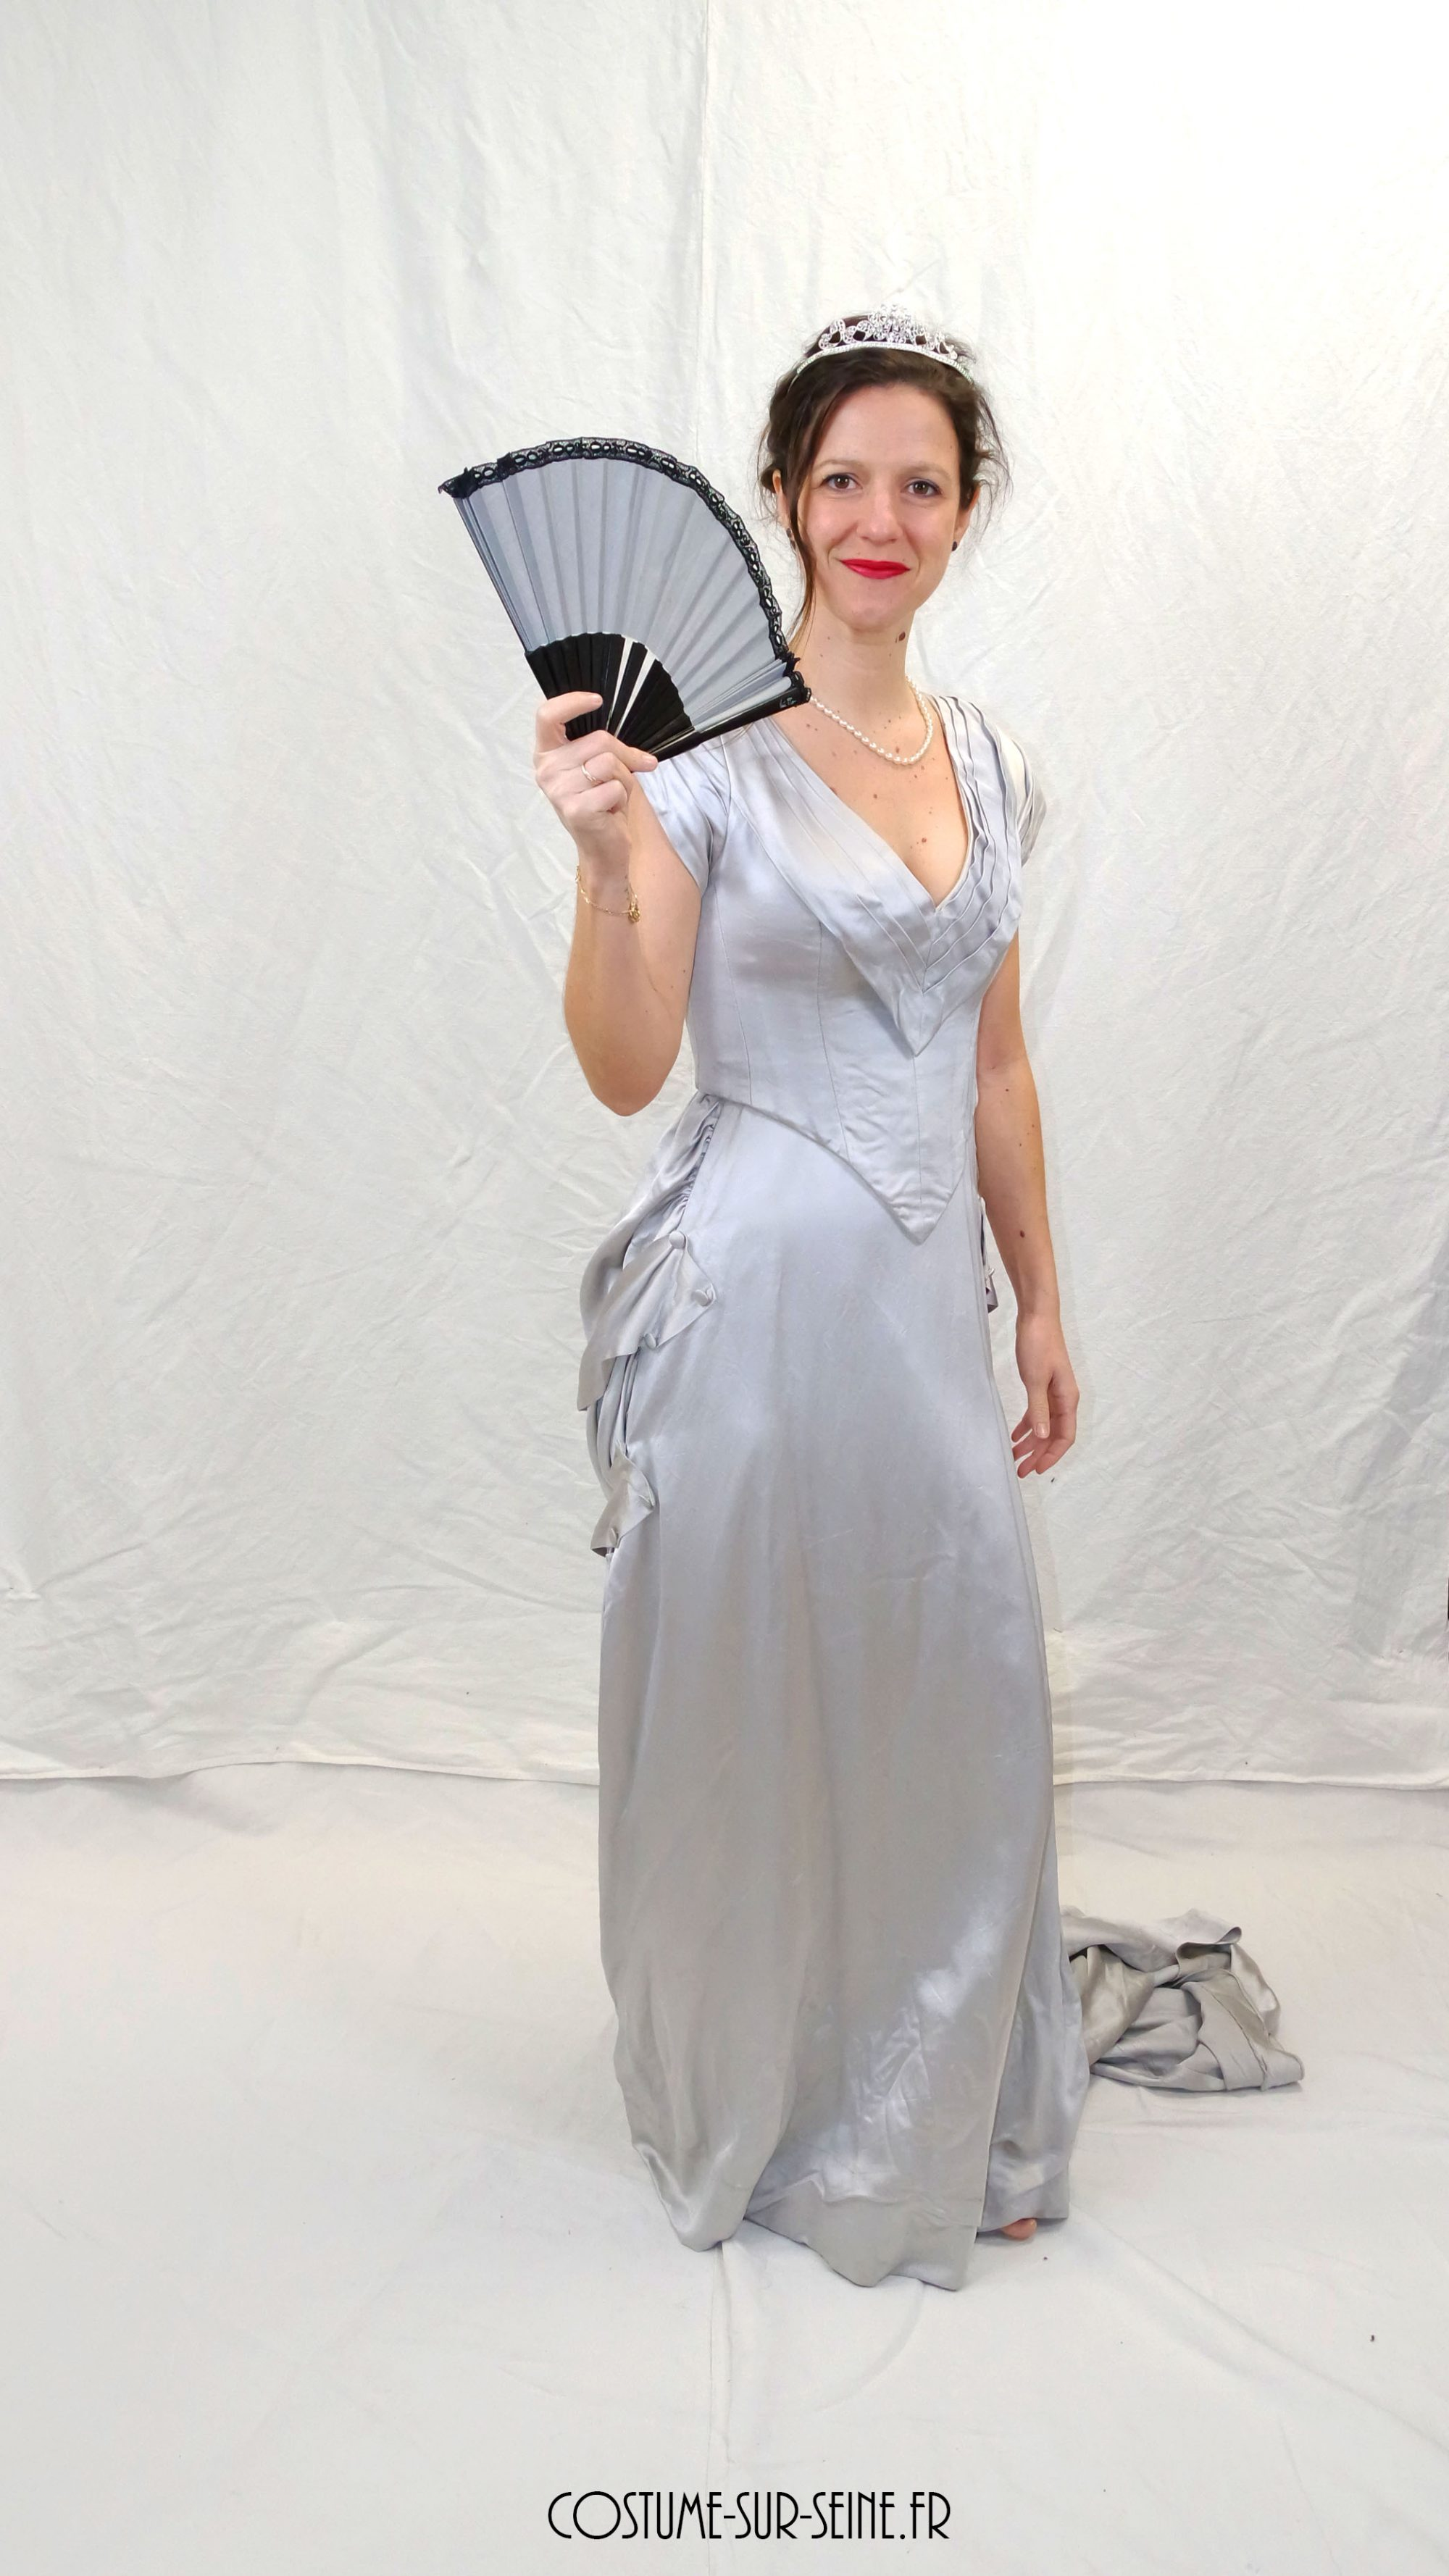 costume robe de bal